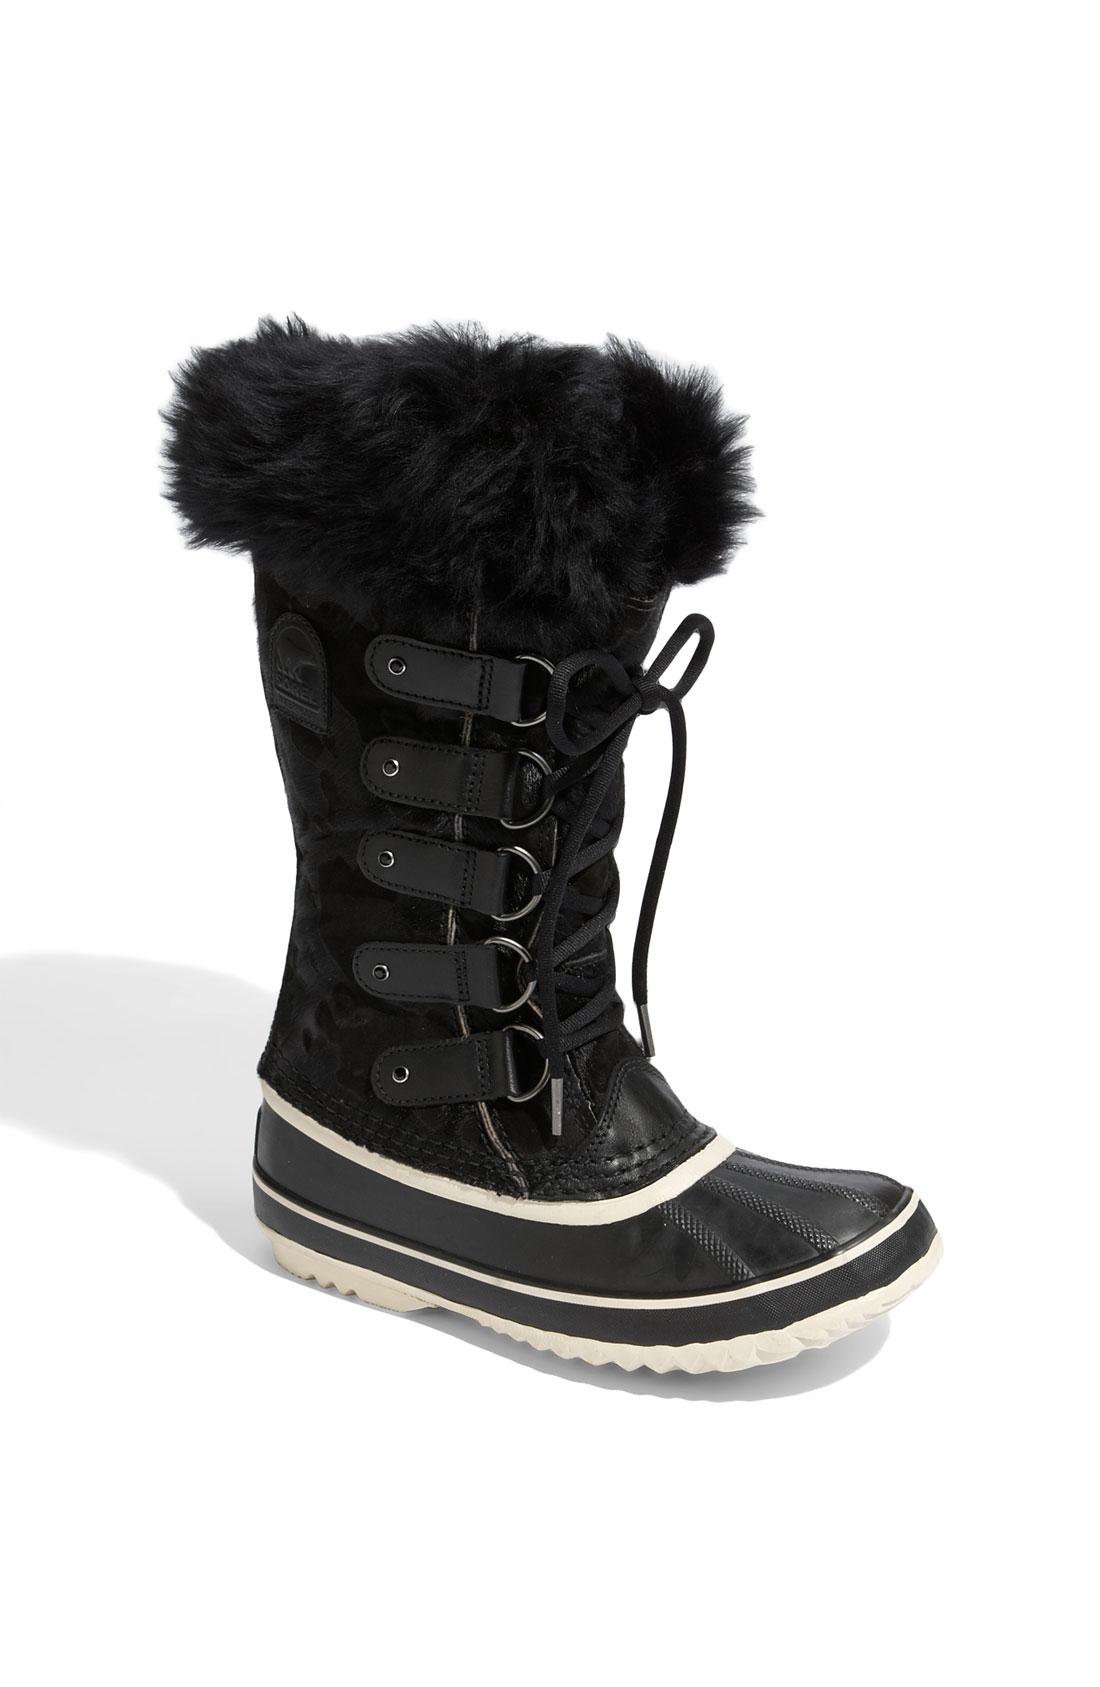 Sorel Joan Of Arctic Boot In Black Lyst